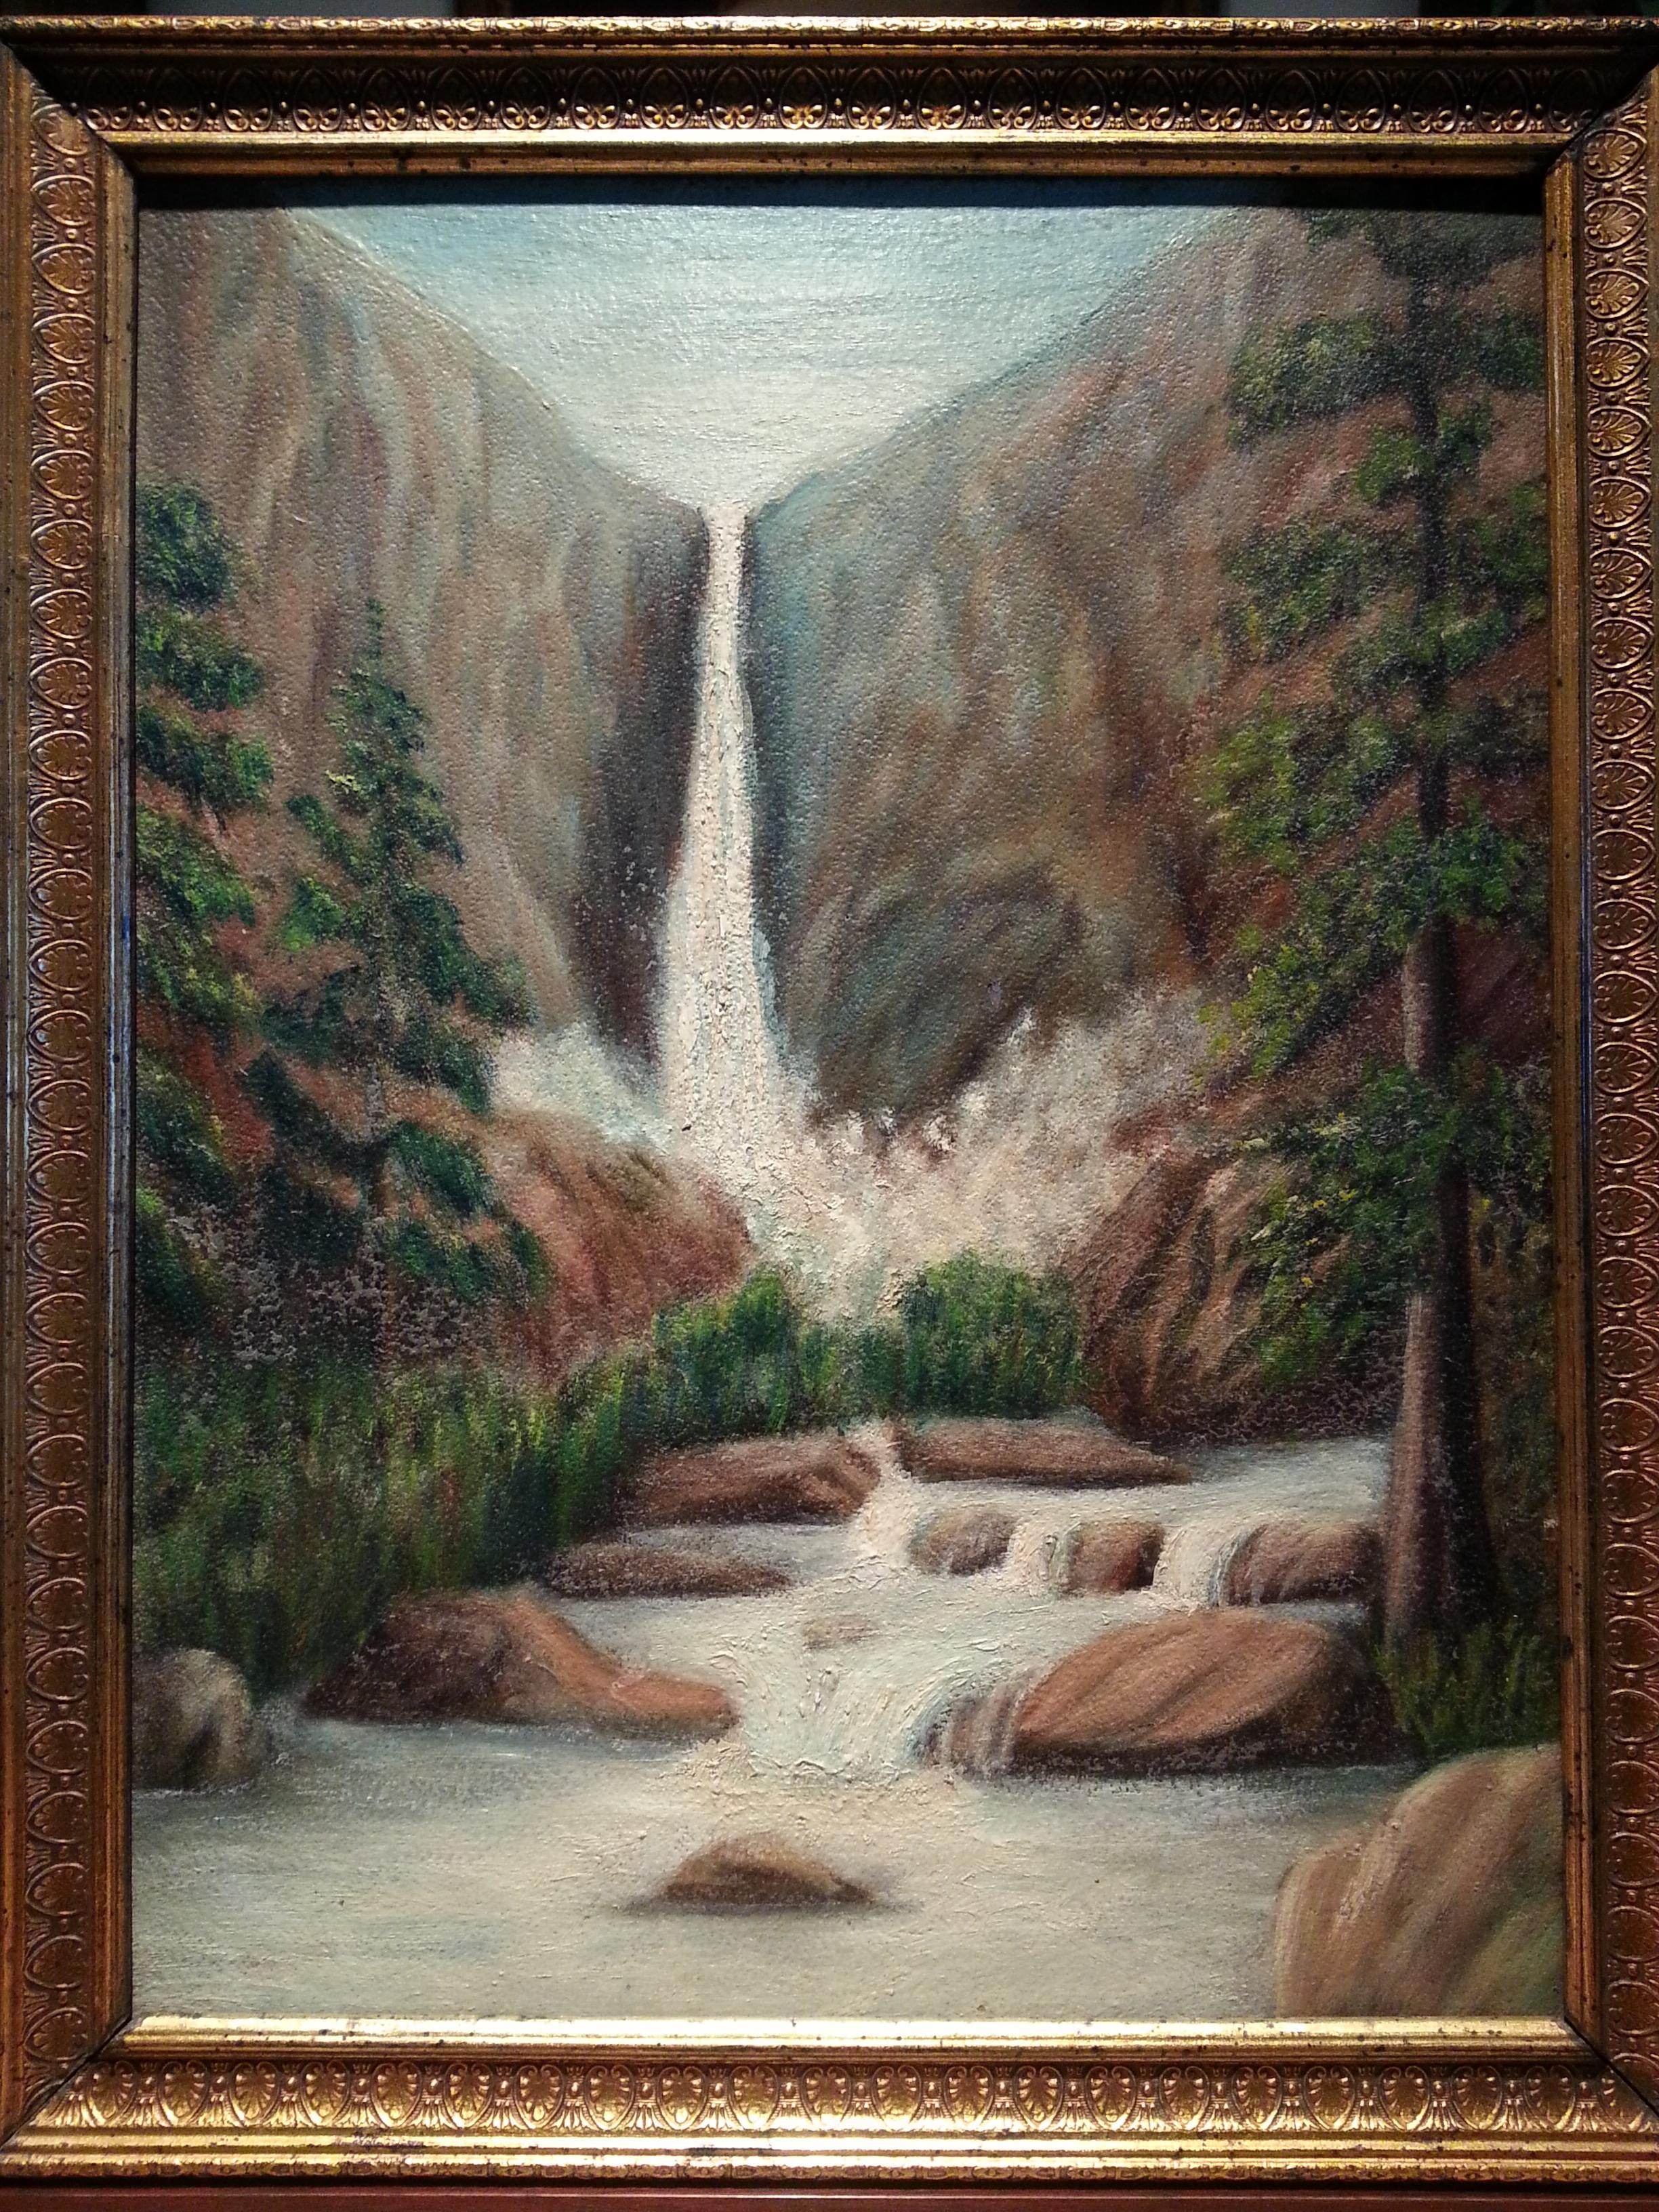 "Primitive Antique Oil Painting / Antique Frame    18 3/4"" x 15"" Frame O.D.    $450"